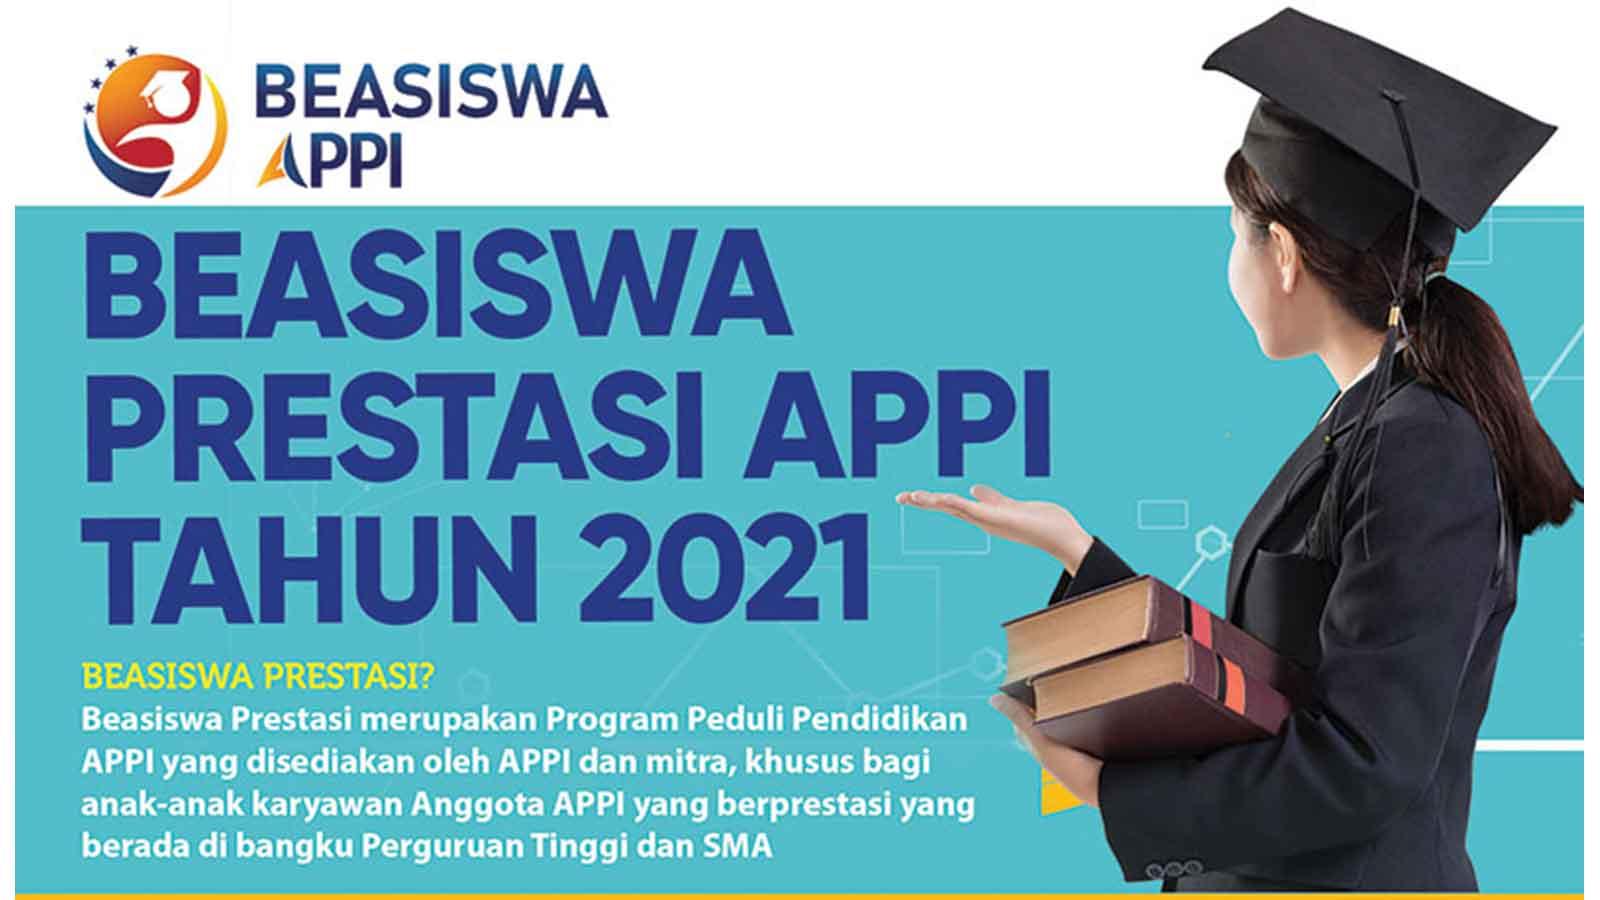 Beasiswa Prestasi 2021